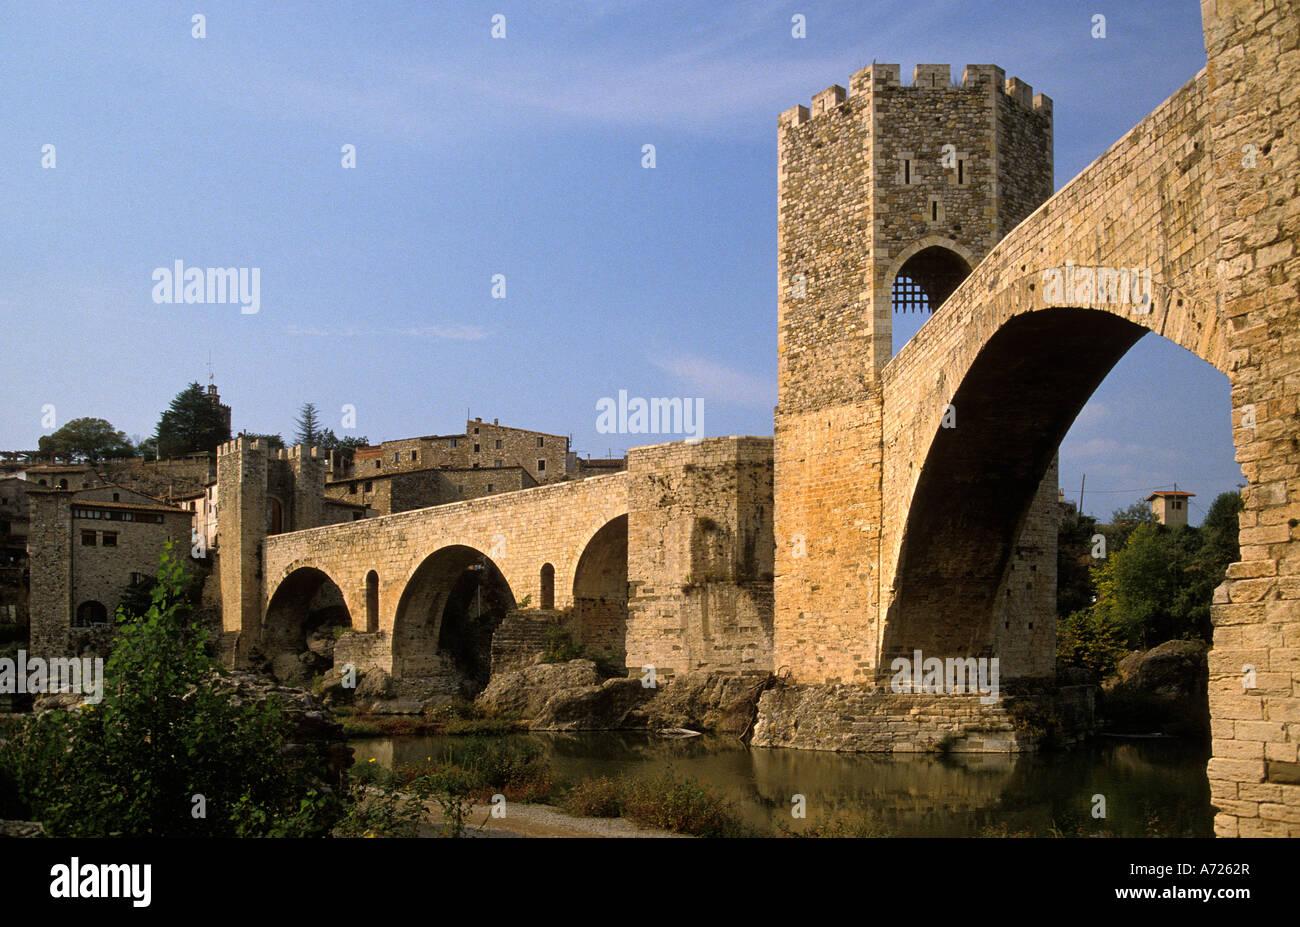 Medievale, ponte fortificato a Besalu, Catalogna, Spagna Immagini Stock